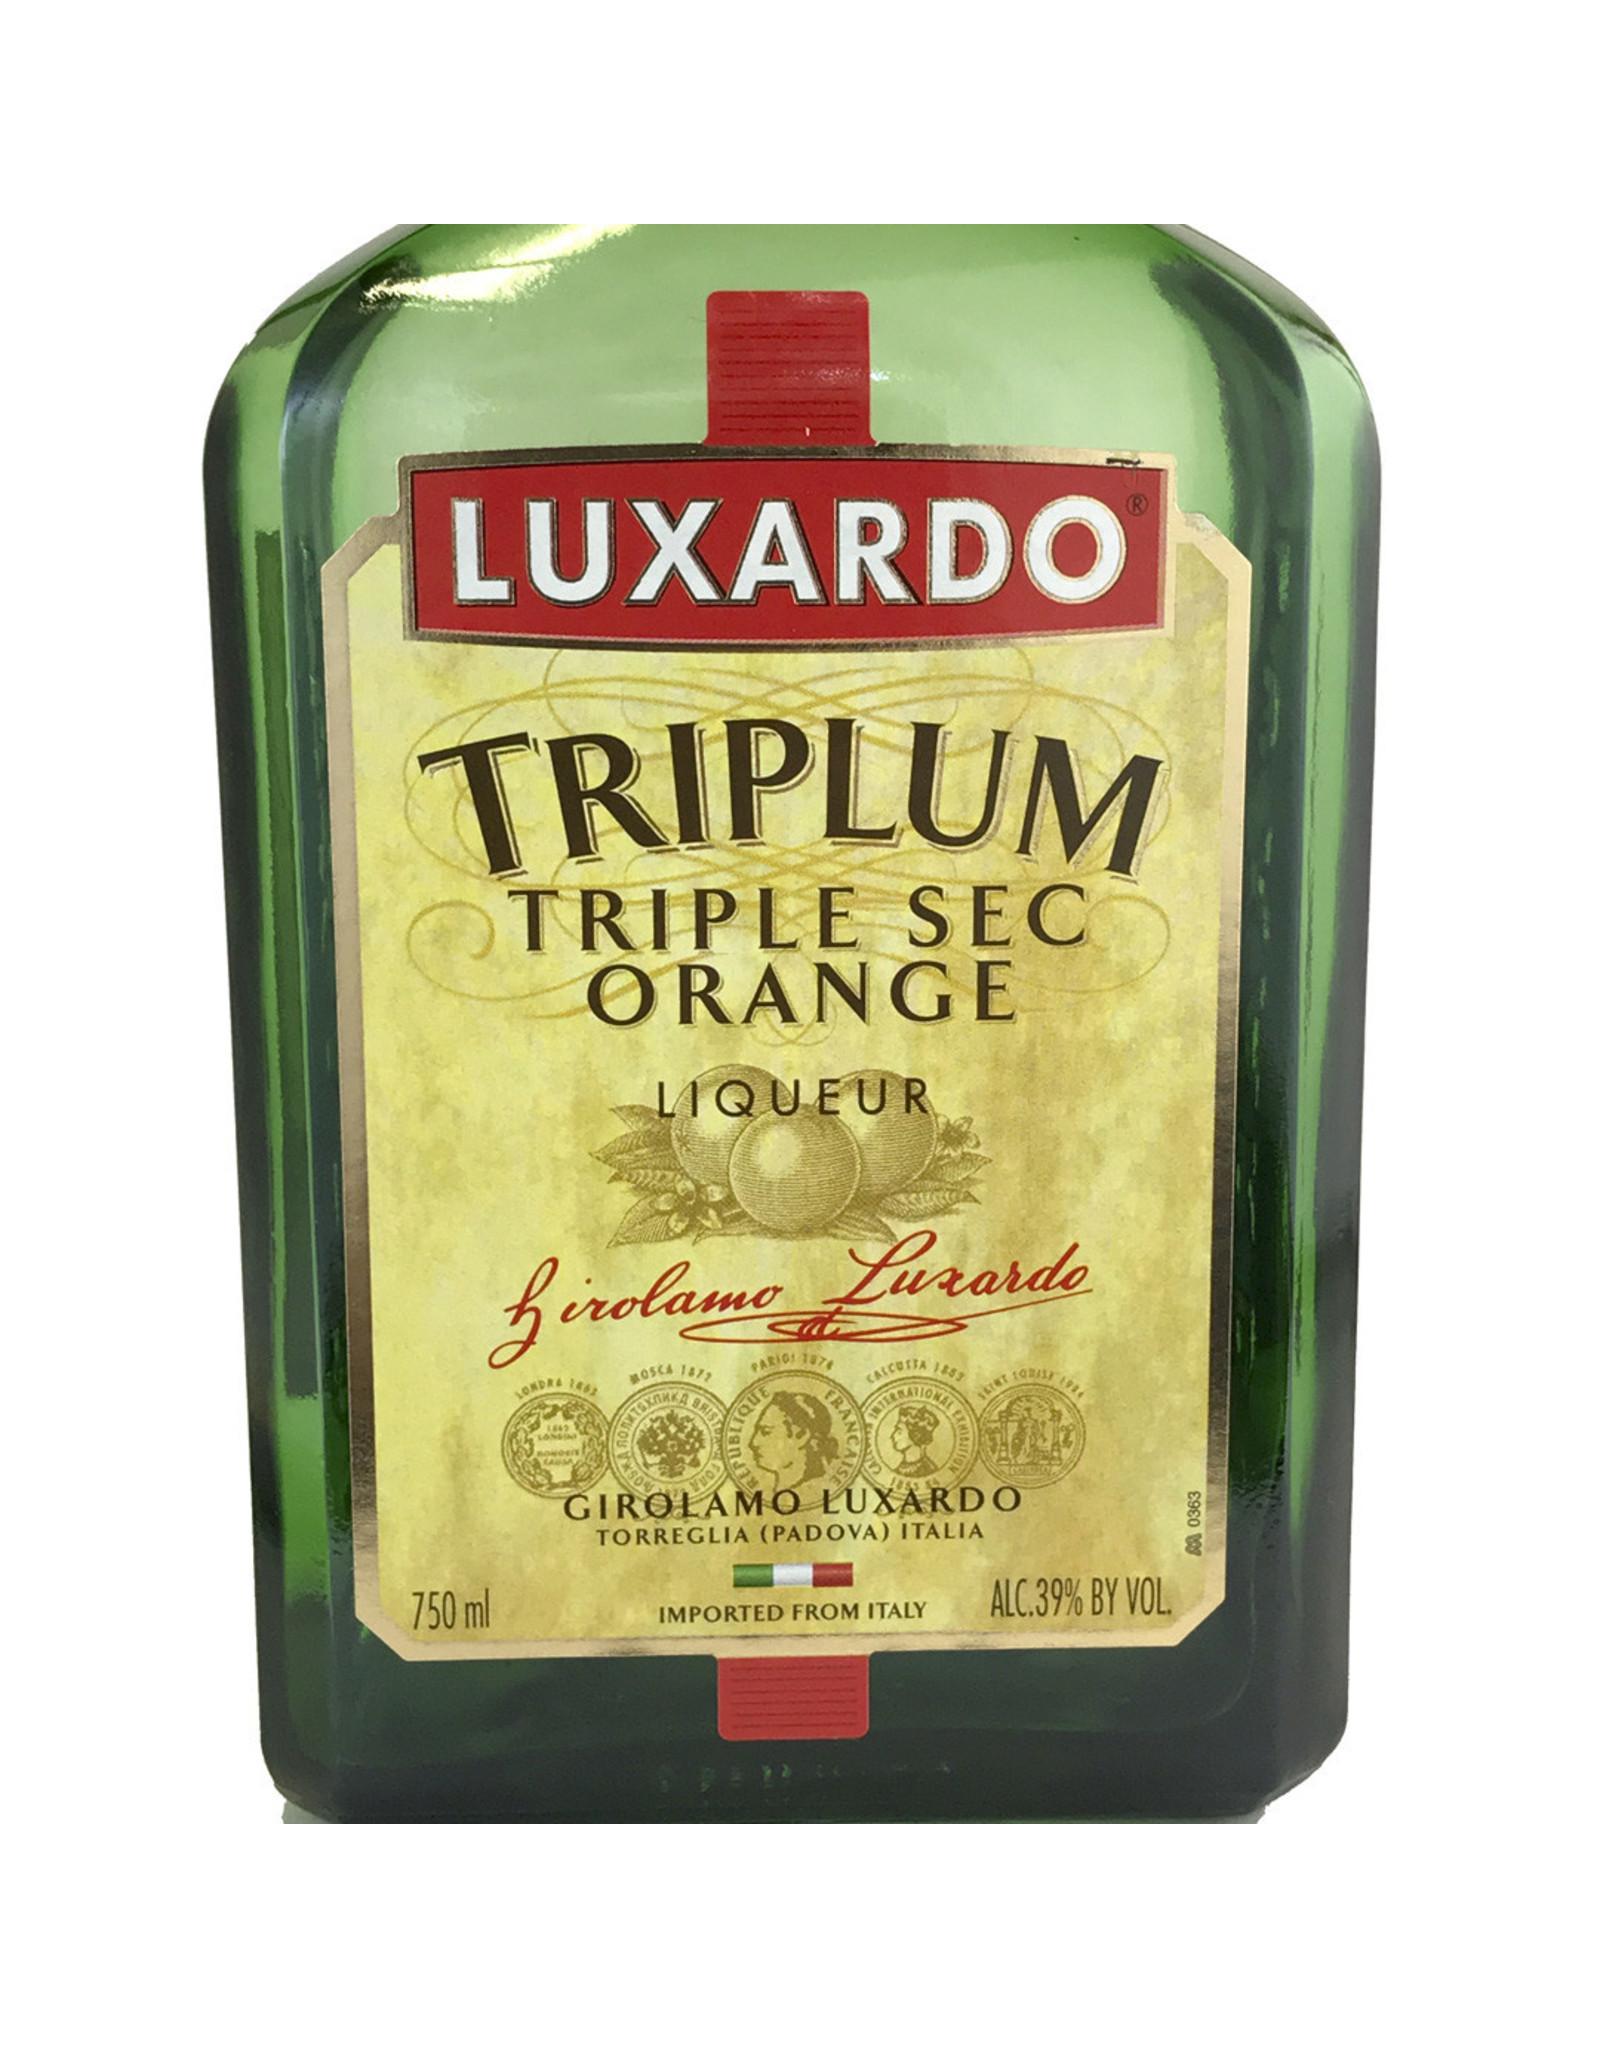 Luxardo Triple Sec Orange Dry Liqueur, Italy